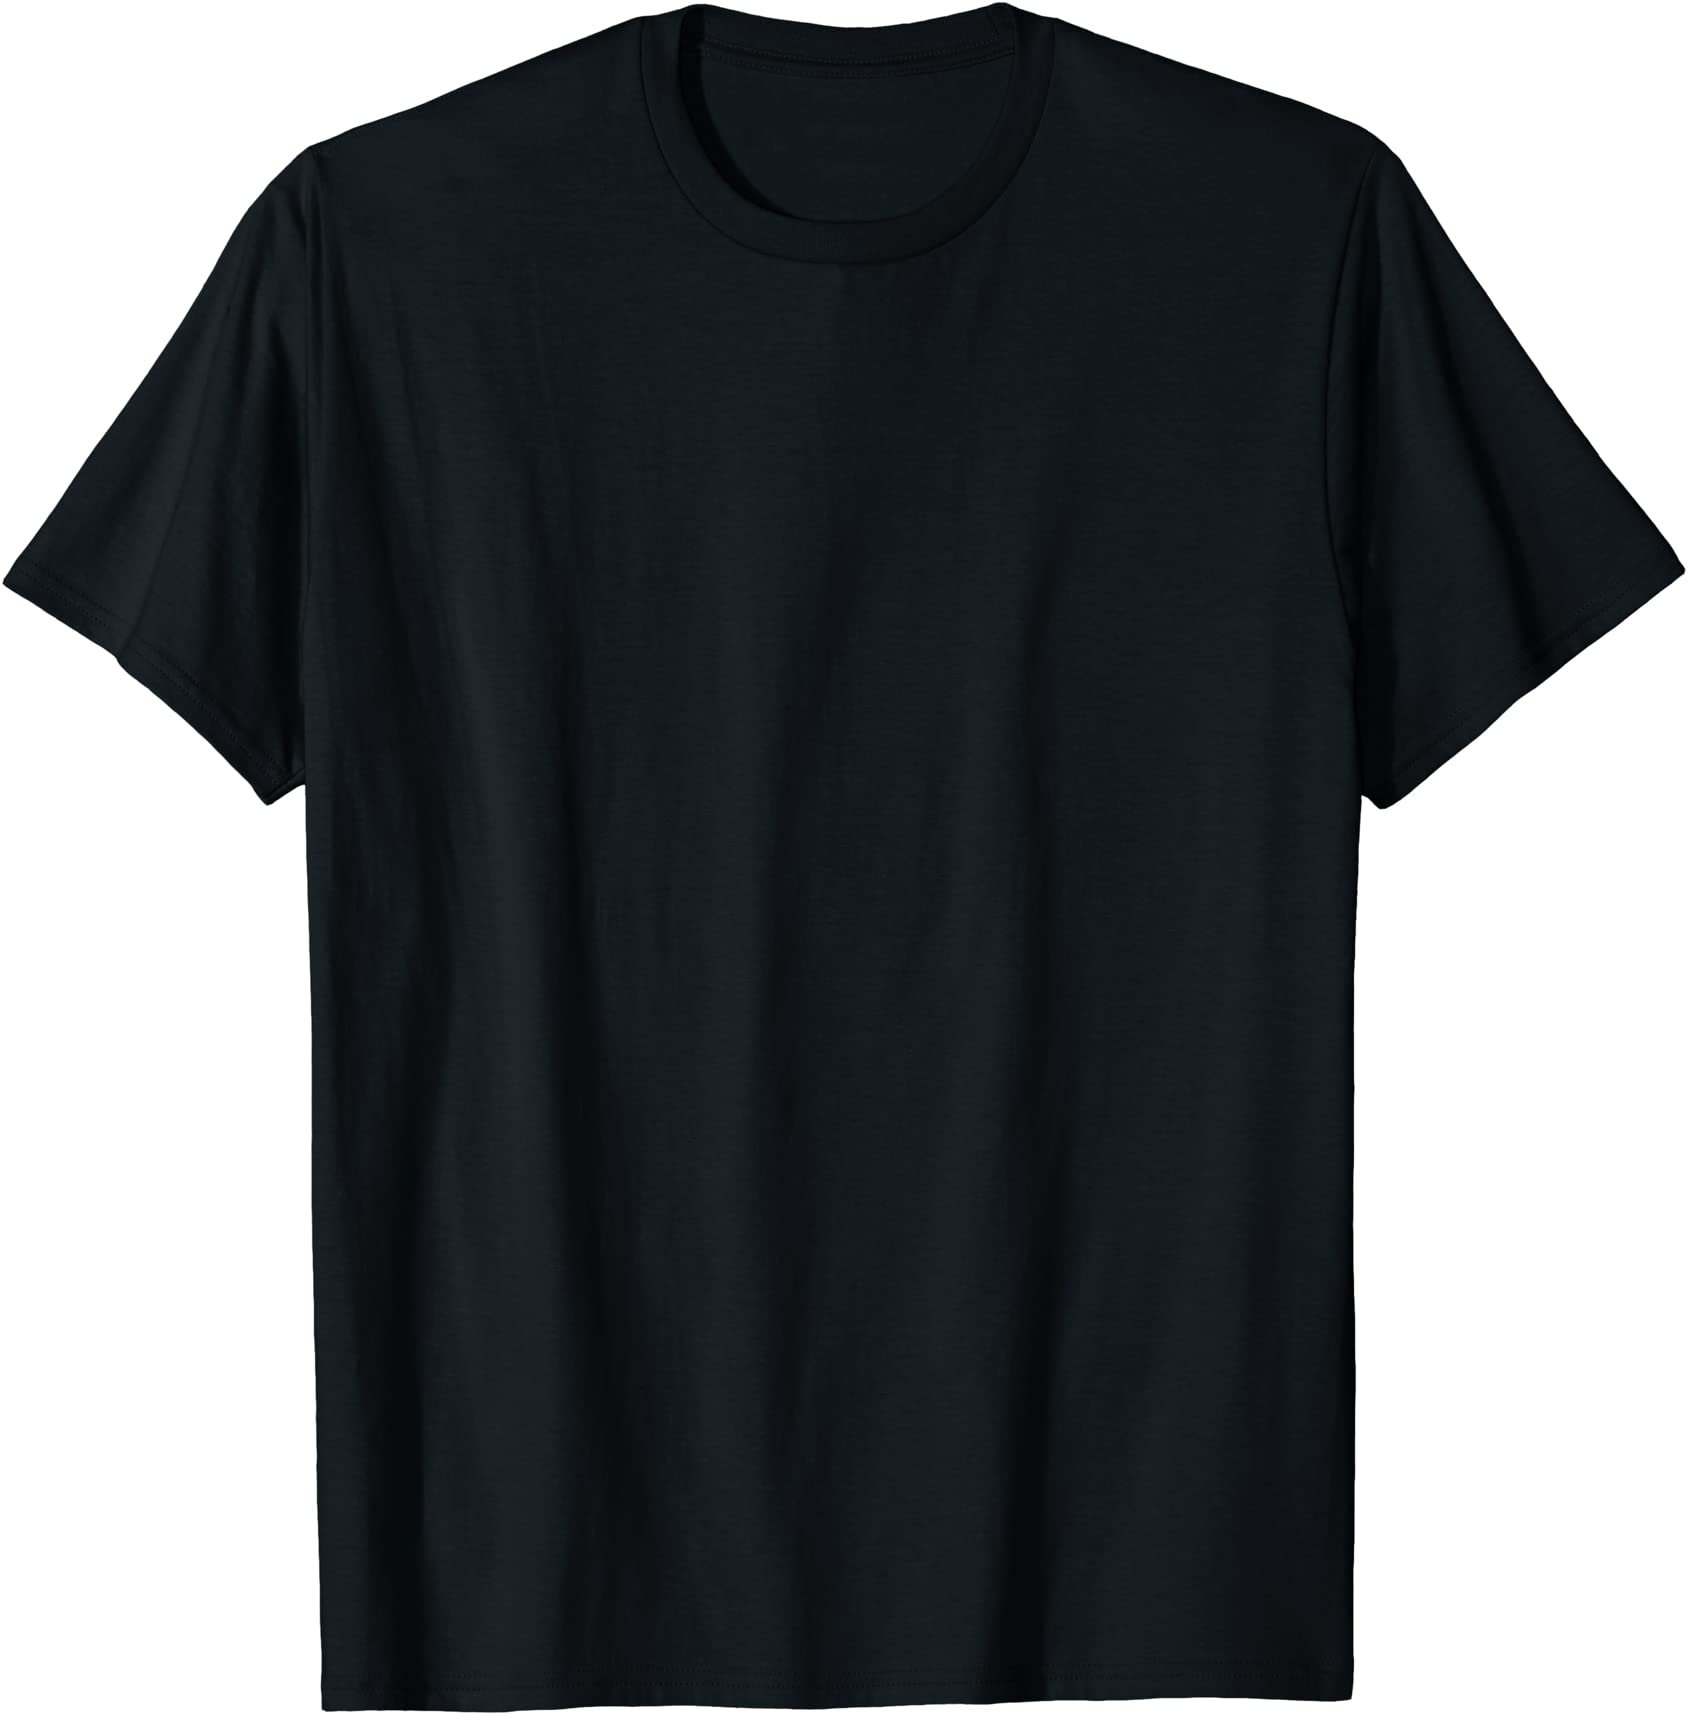 F-15 Strike Eagle Squadron T-Shirt